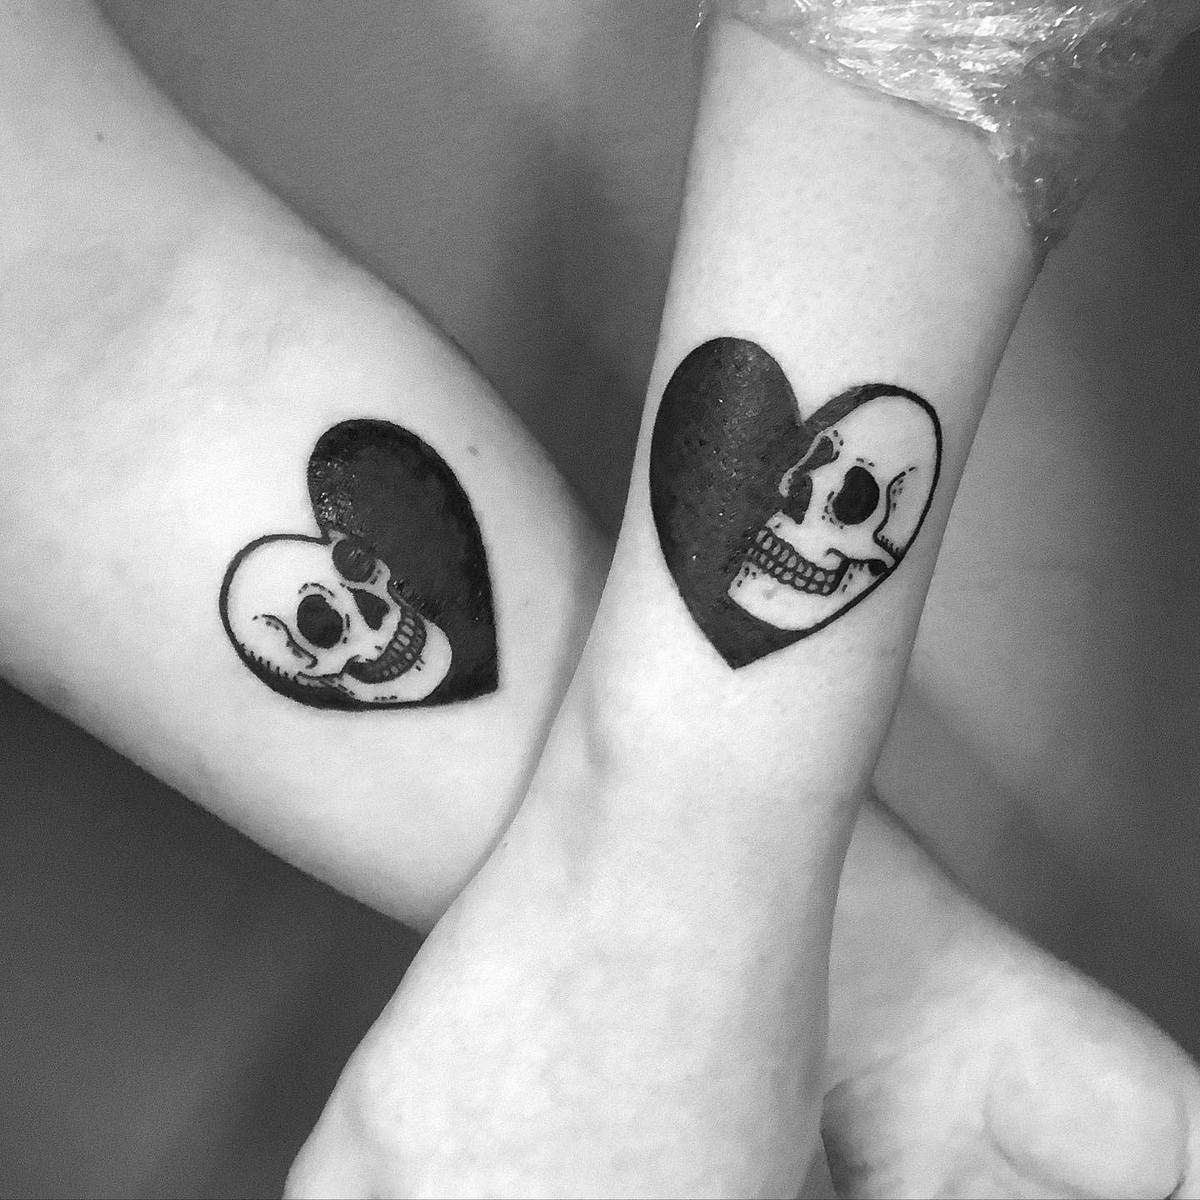 Heart Matching Tattoos iiris_ink